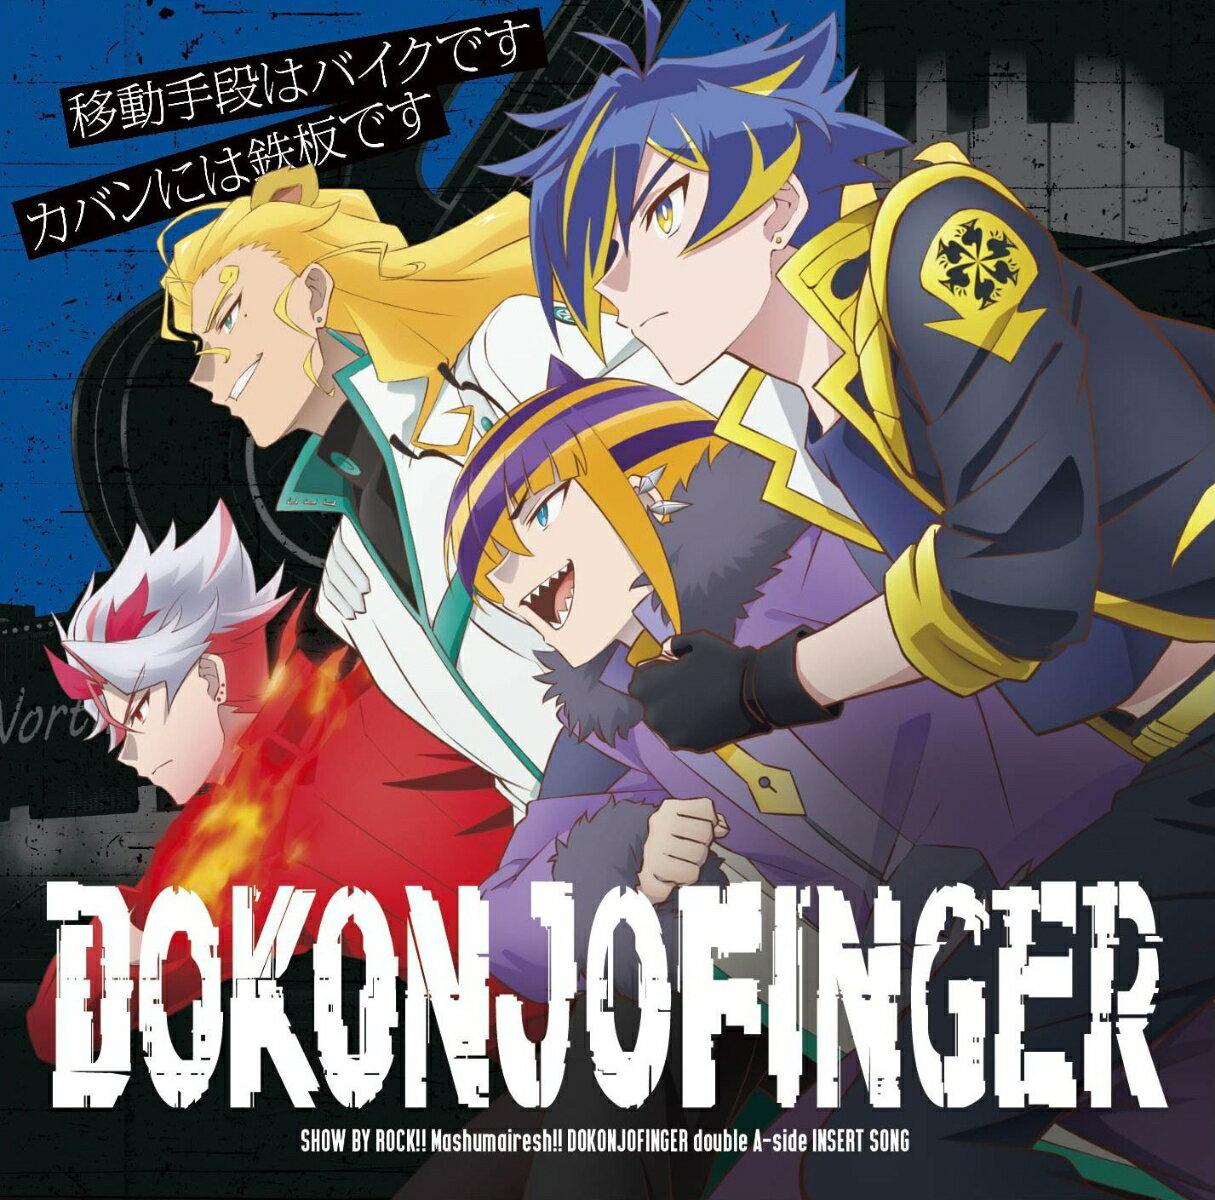 CD, アニメ TVSHOW BY ROCK!!!!DOKONJOFINGER double A-side DOKONJOFINGER